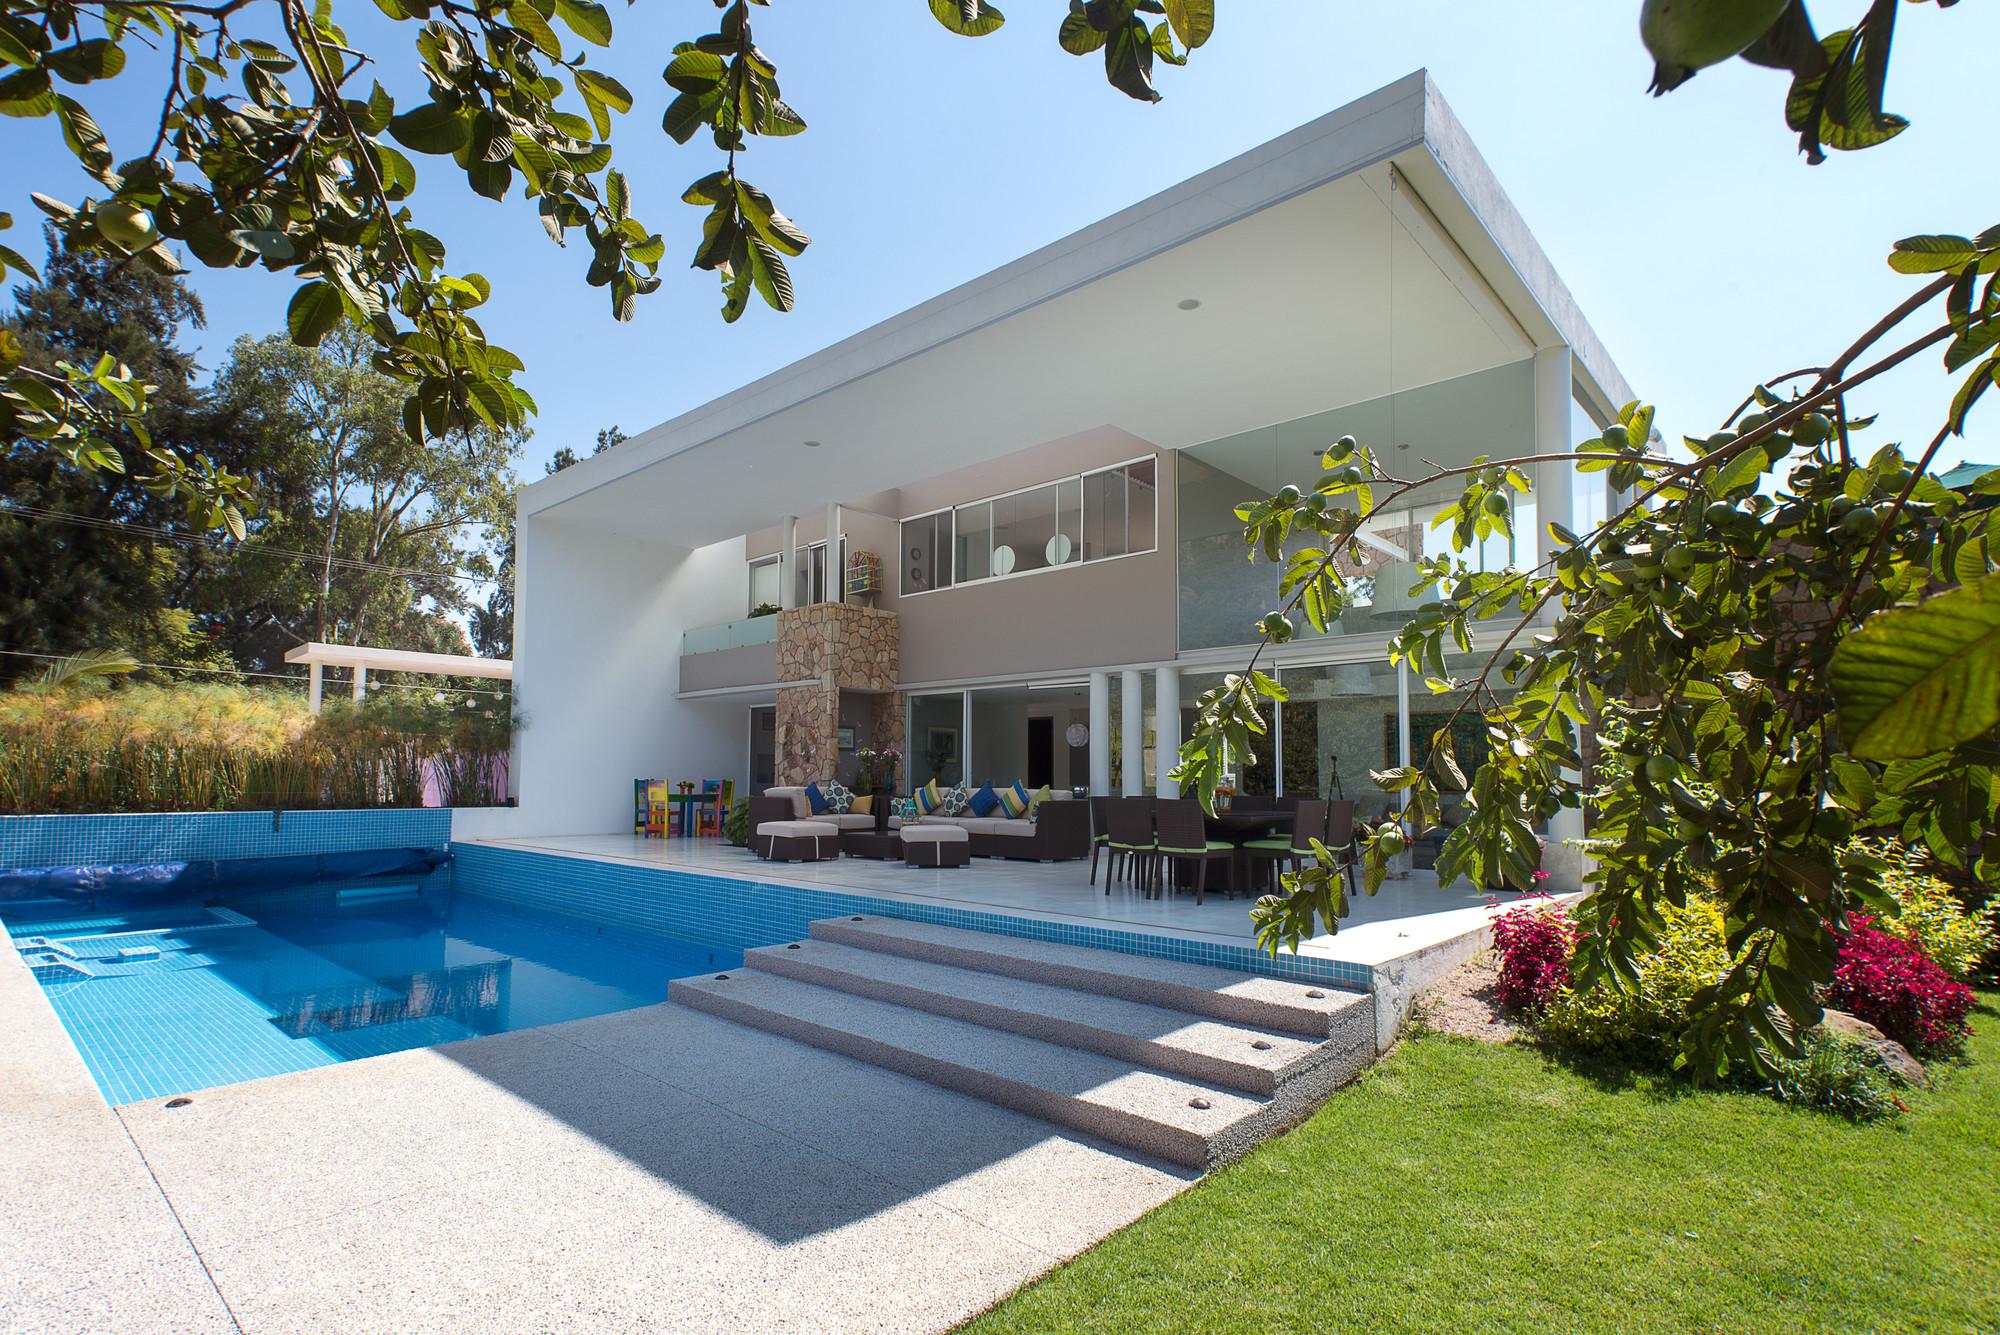 Casa del viento a 001 taller de arquitectura archdaily for Idee design casa